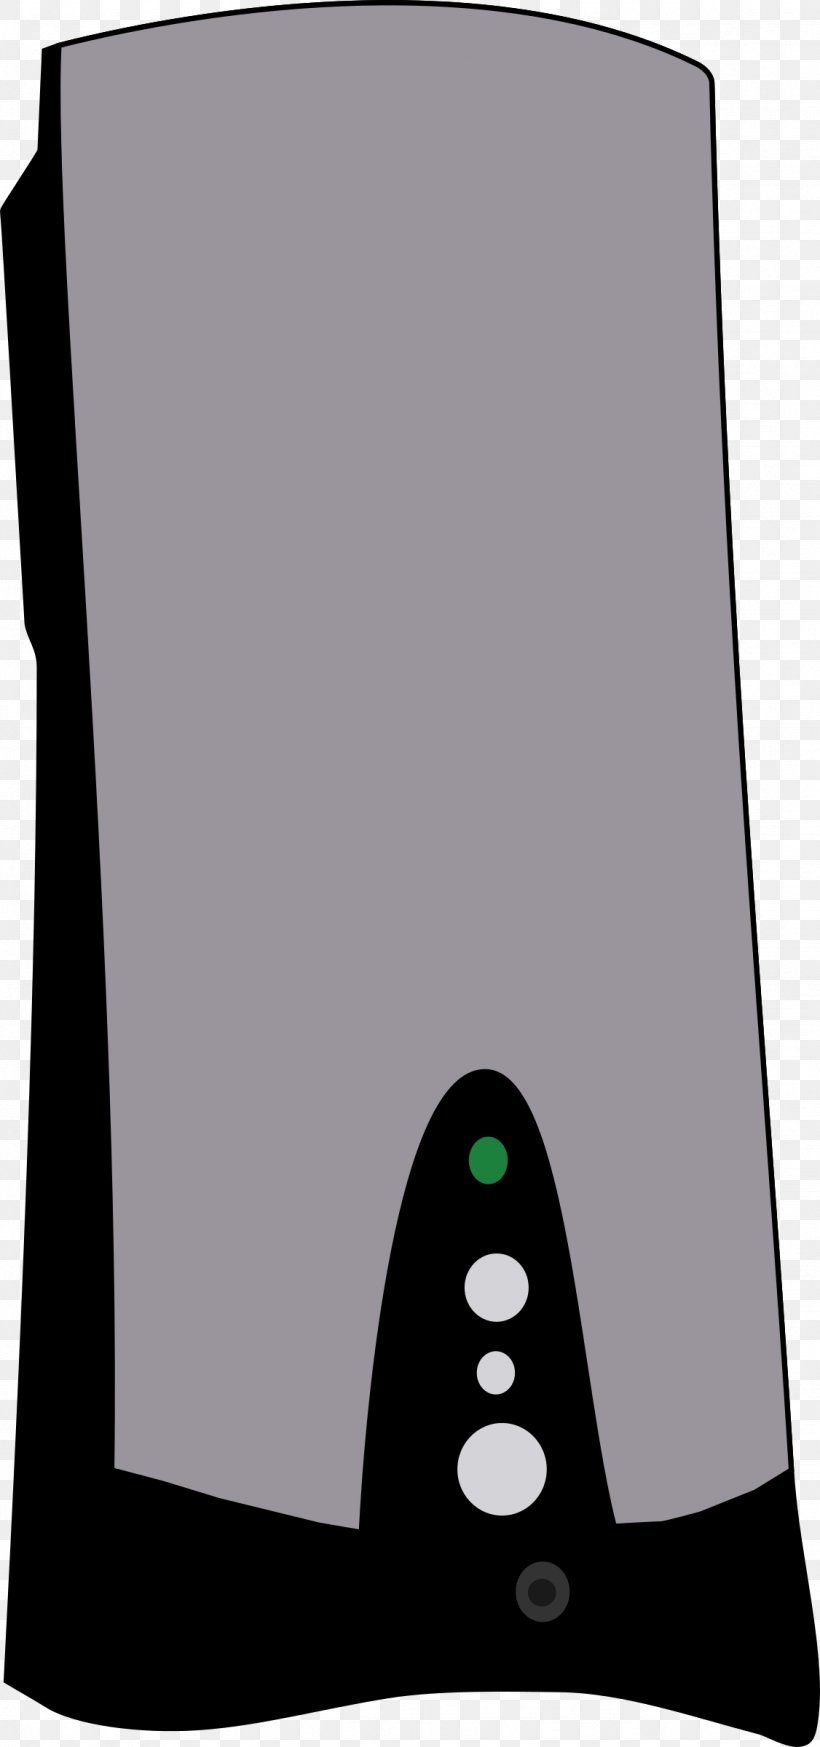 Loudspeaker Clip Art, PNG, 1126x2400px, Loudspeaker, Art, Black, Computer, Computer Speakers Download Free